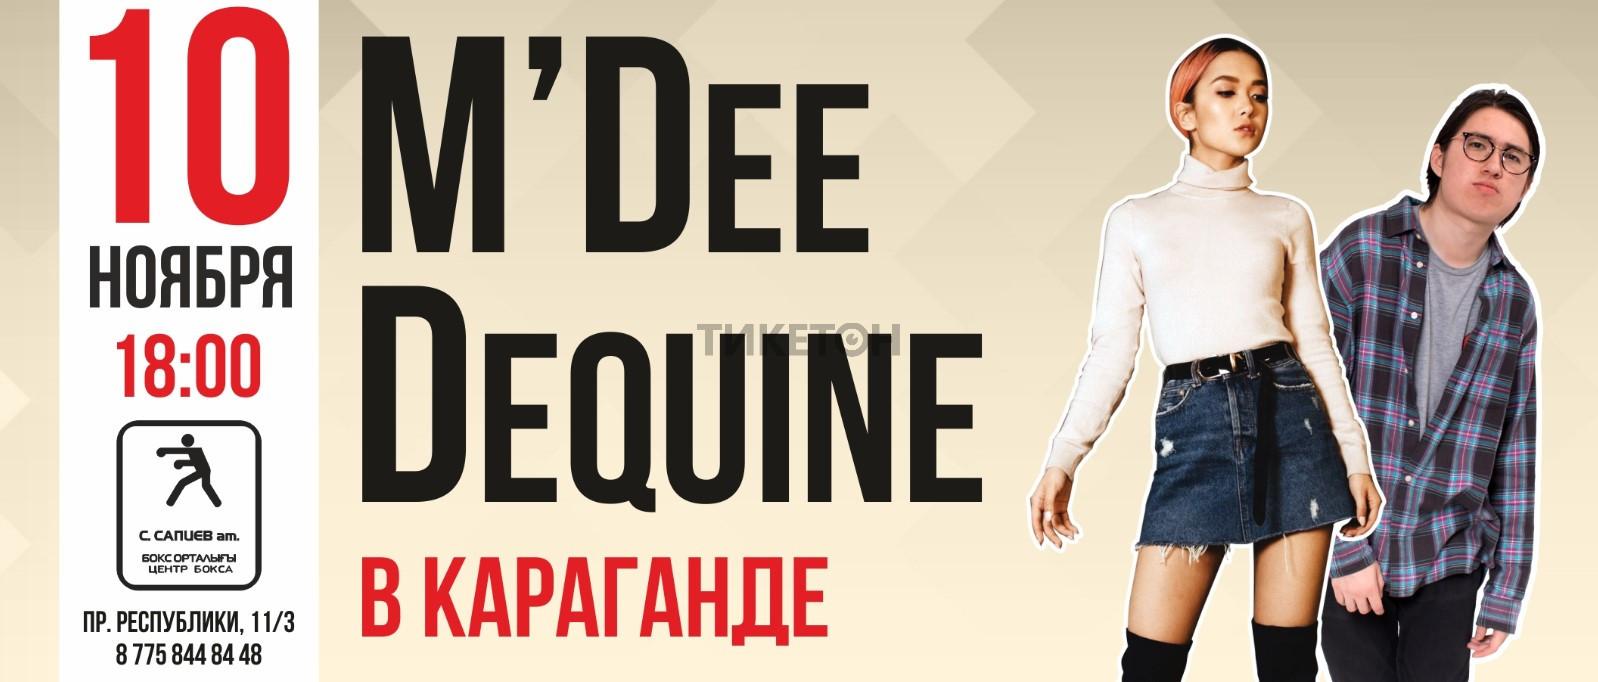 M'Dee и Dequine в Караганде